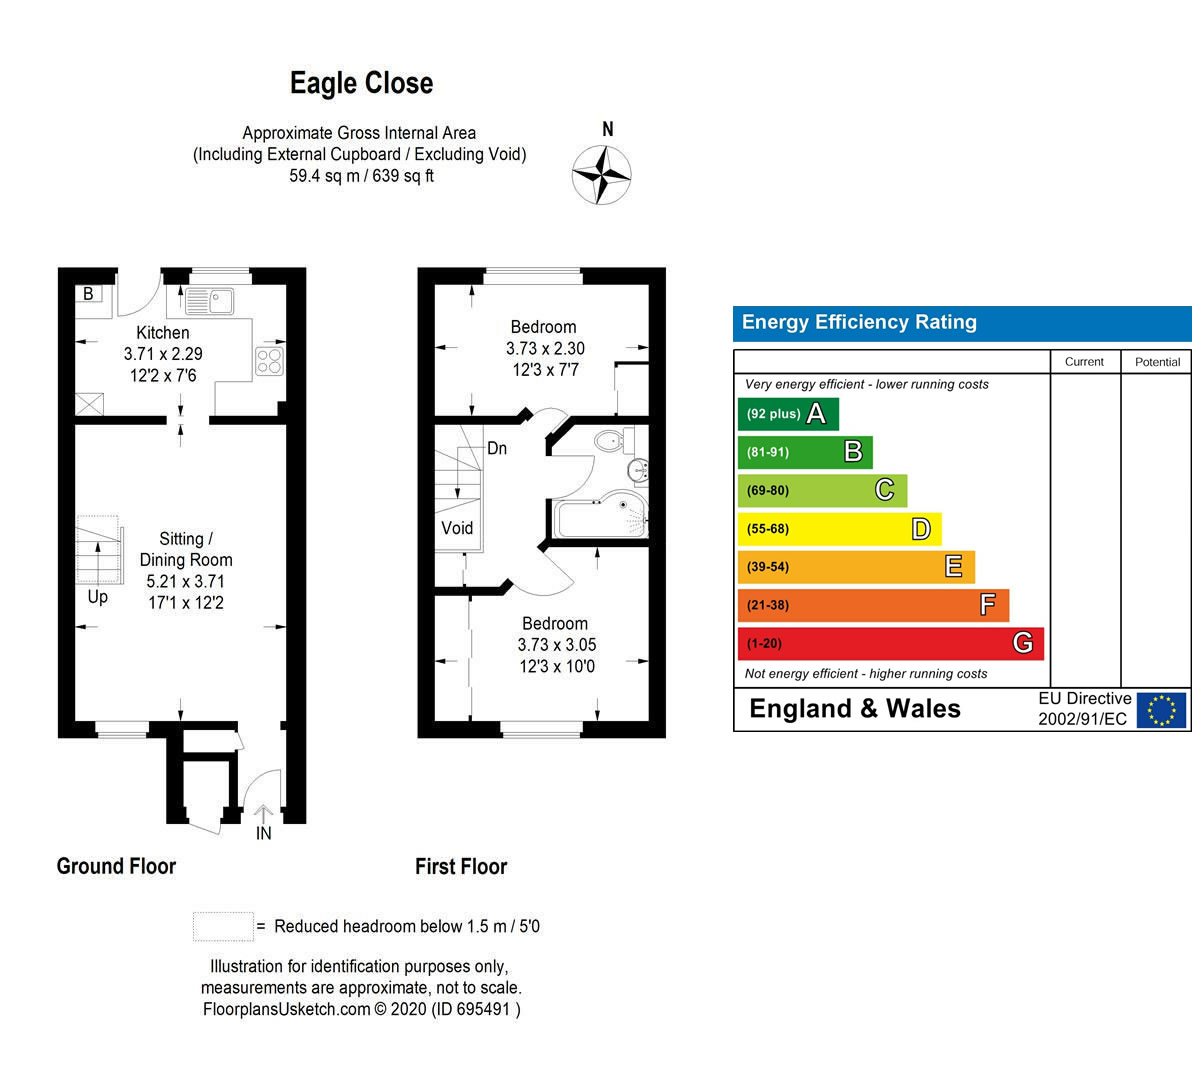 23 Eagle Close brochure